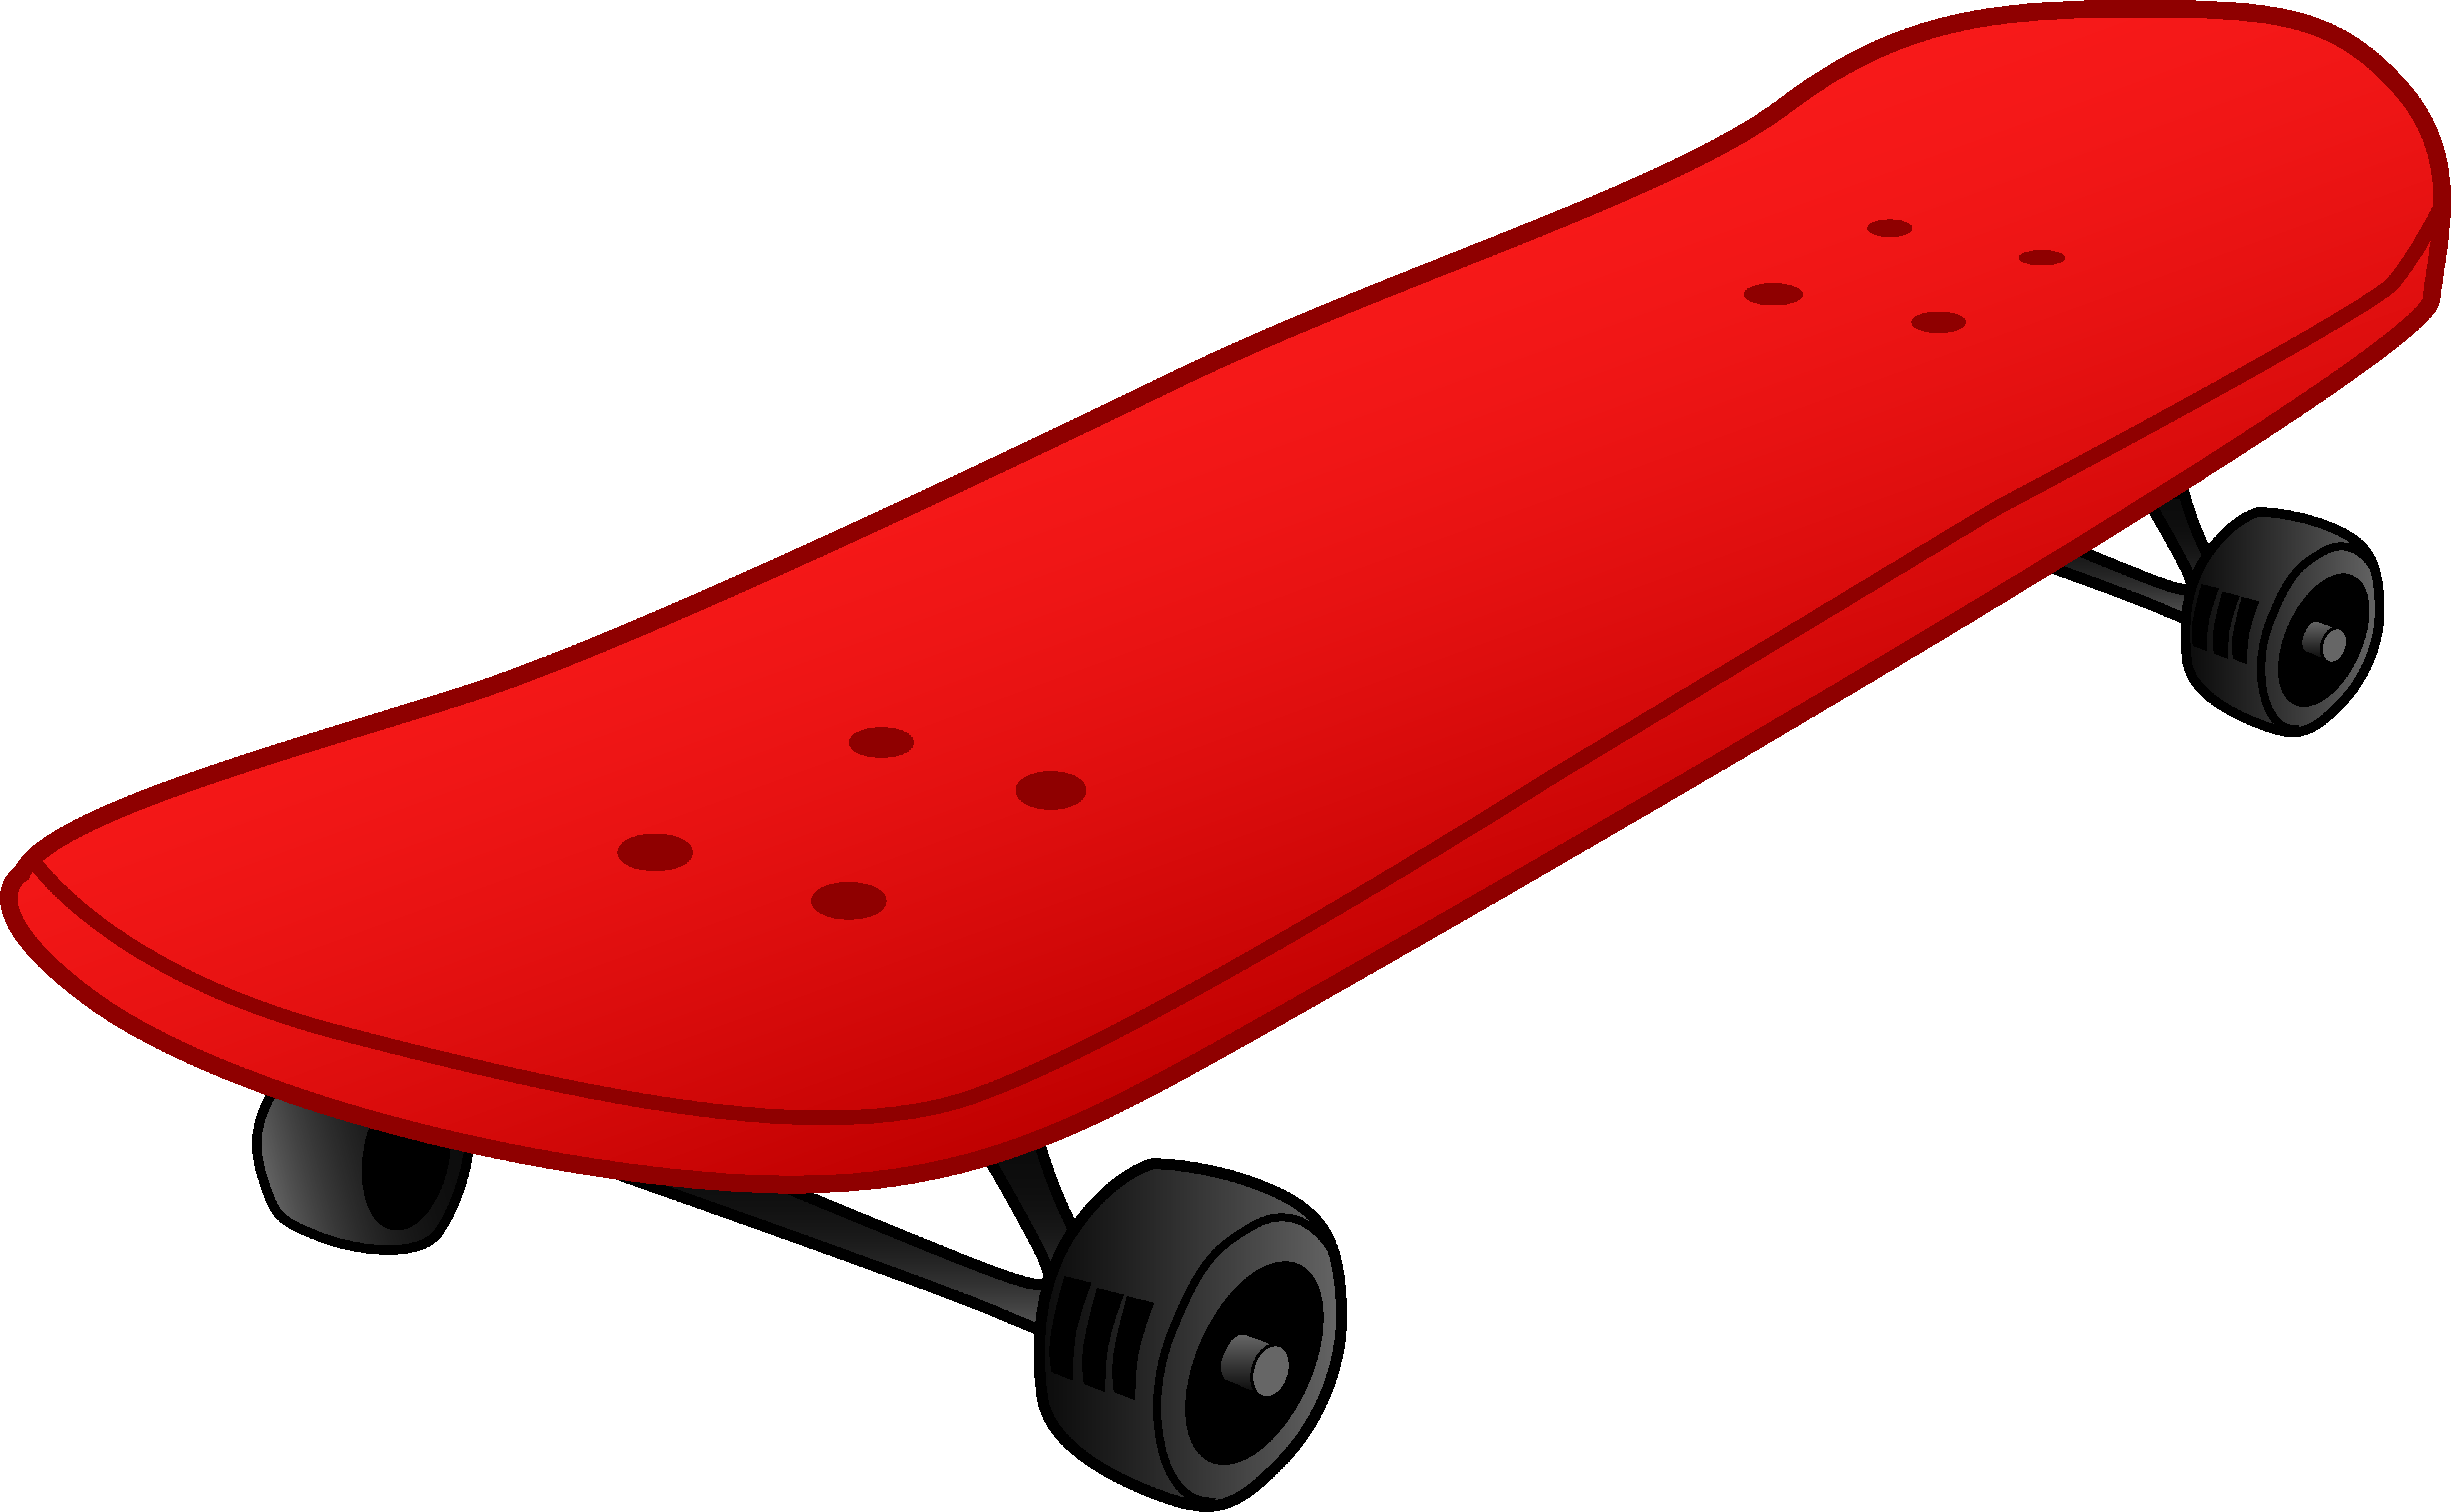 Skateboard HD PNG - 94092